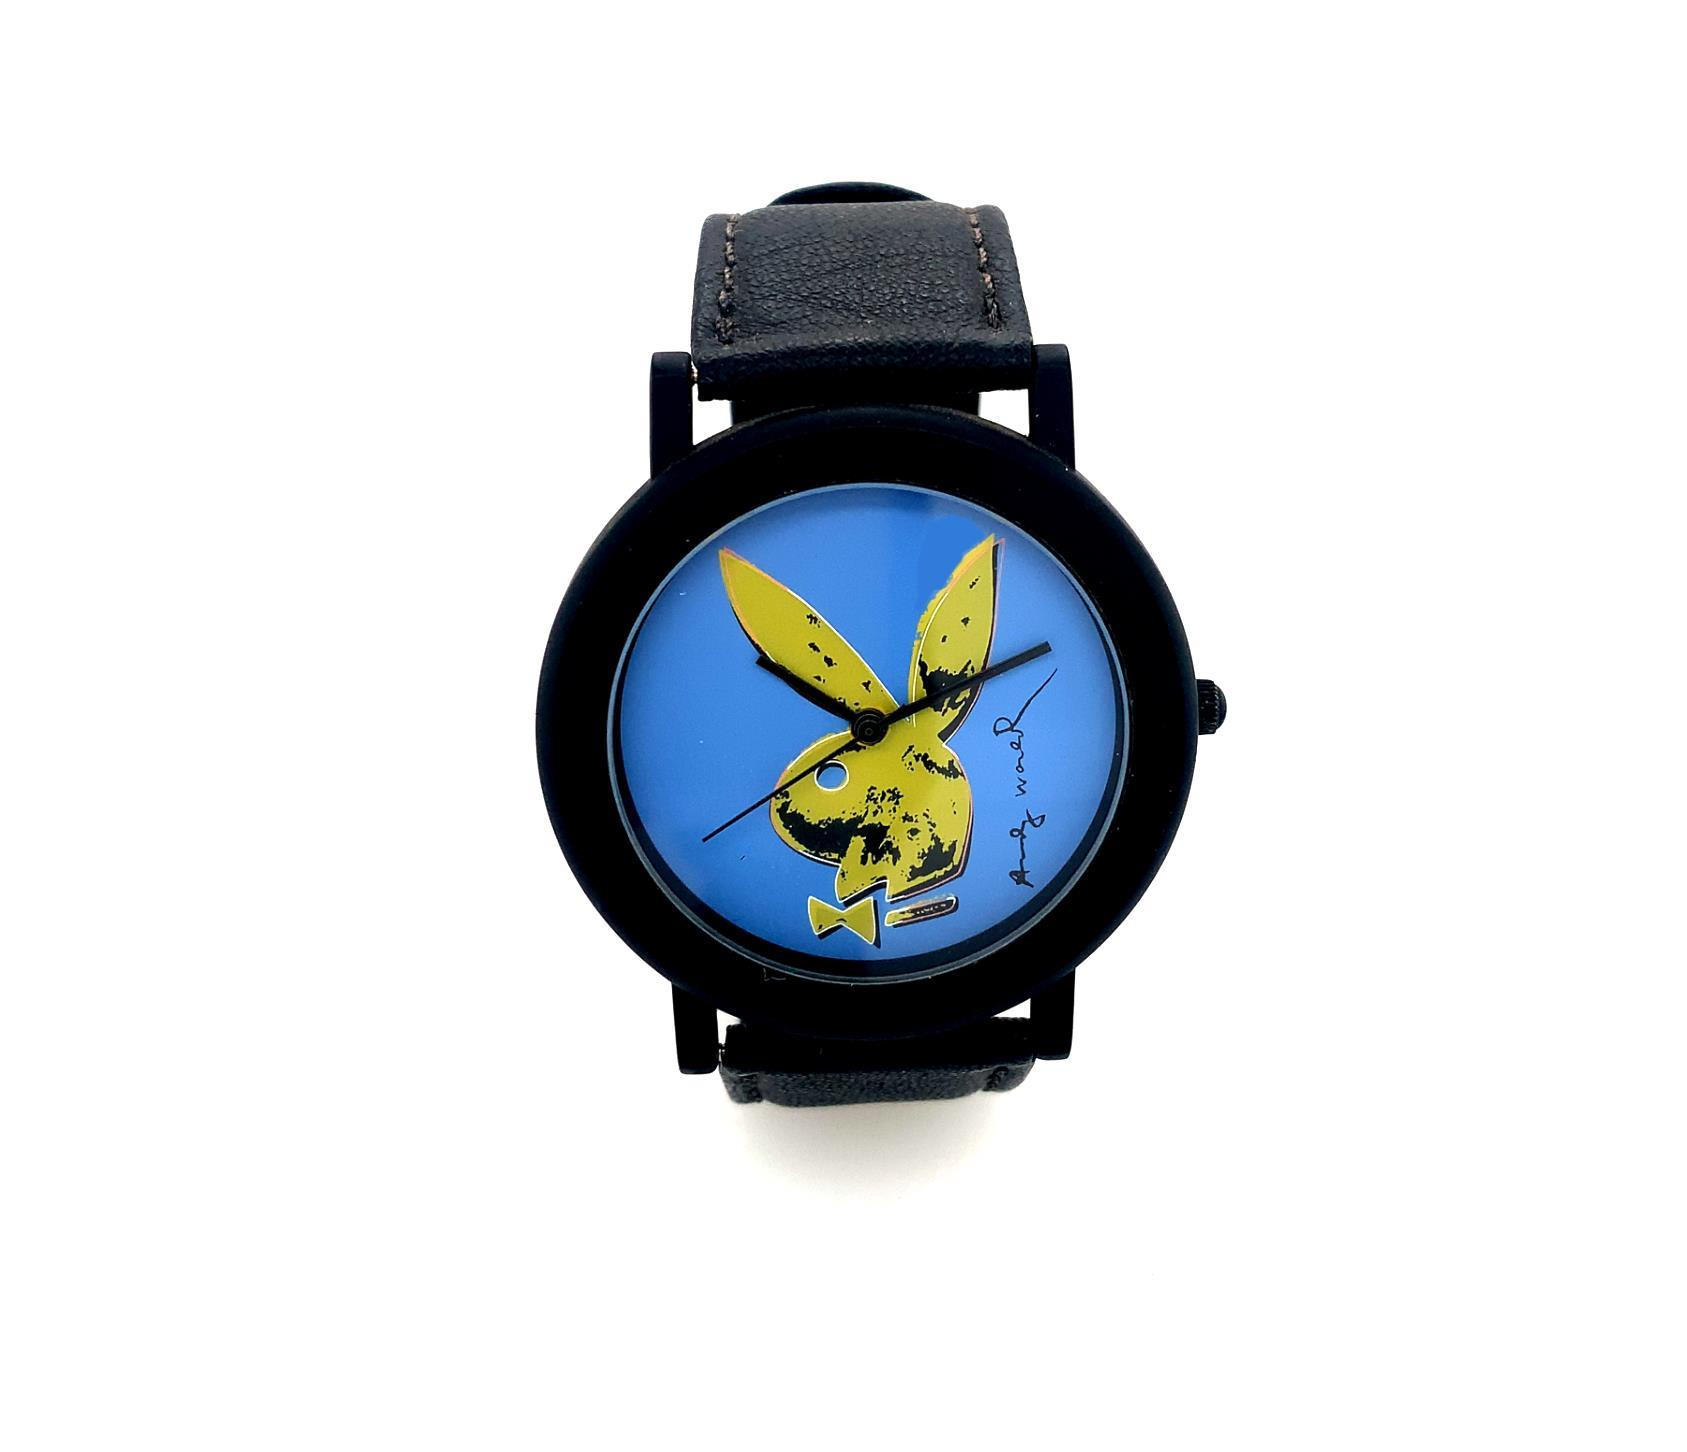 "Uhr ""Rabbit"" lav - Warhol, Andy - k-07798"